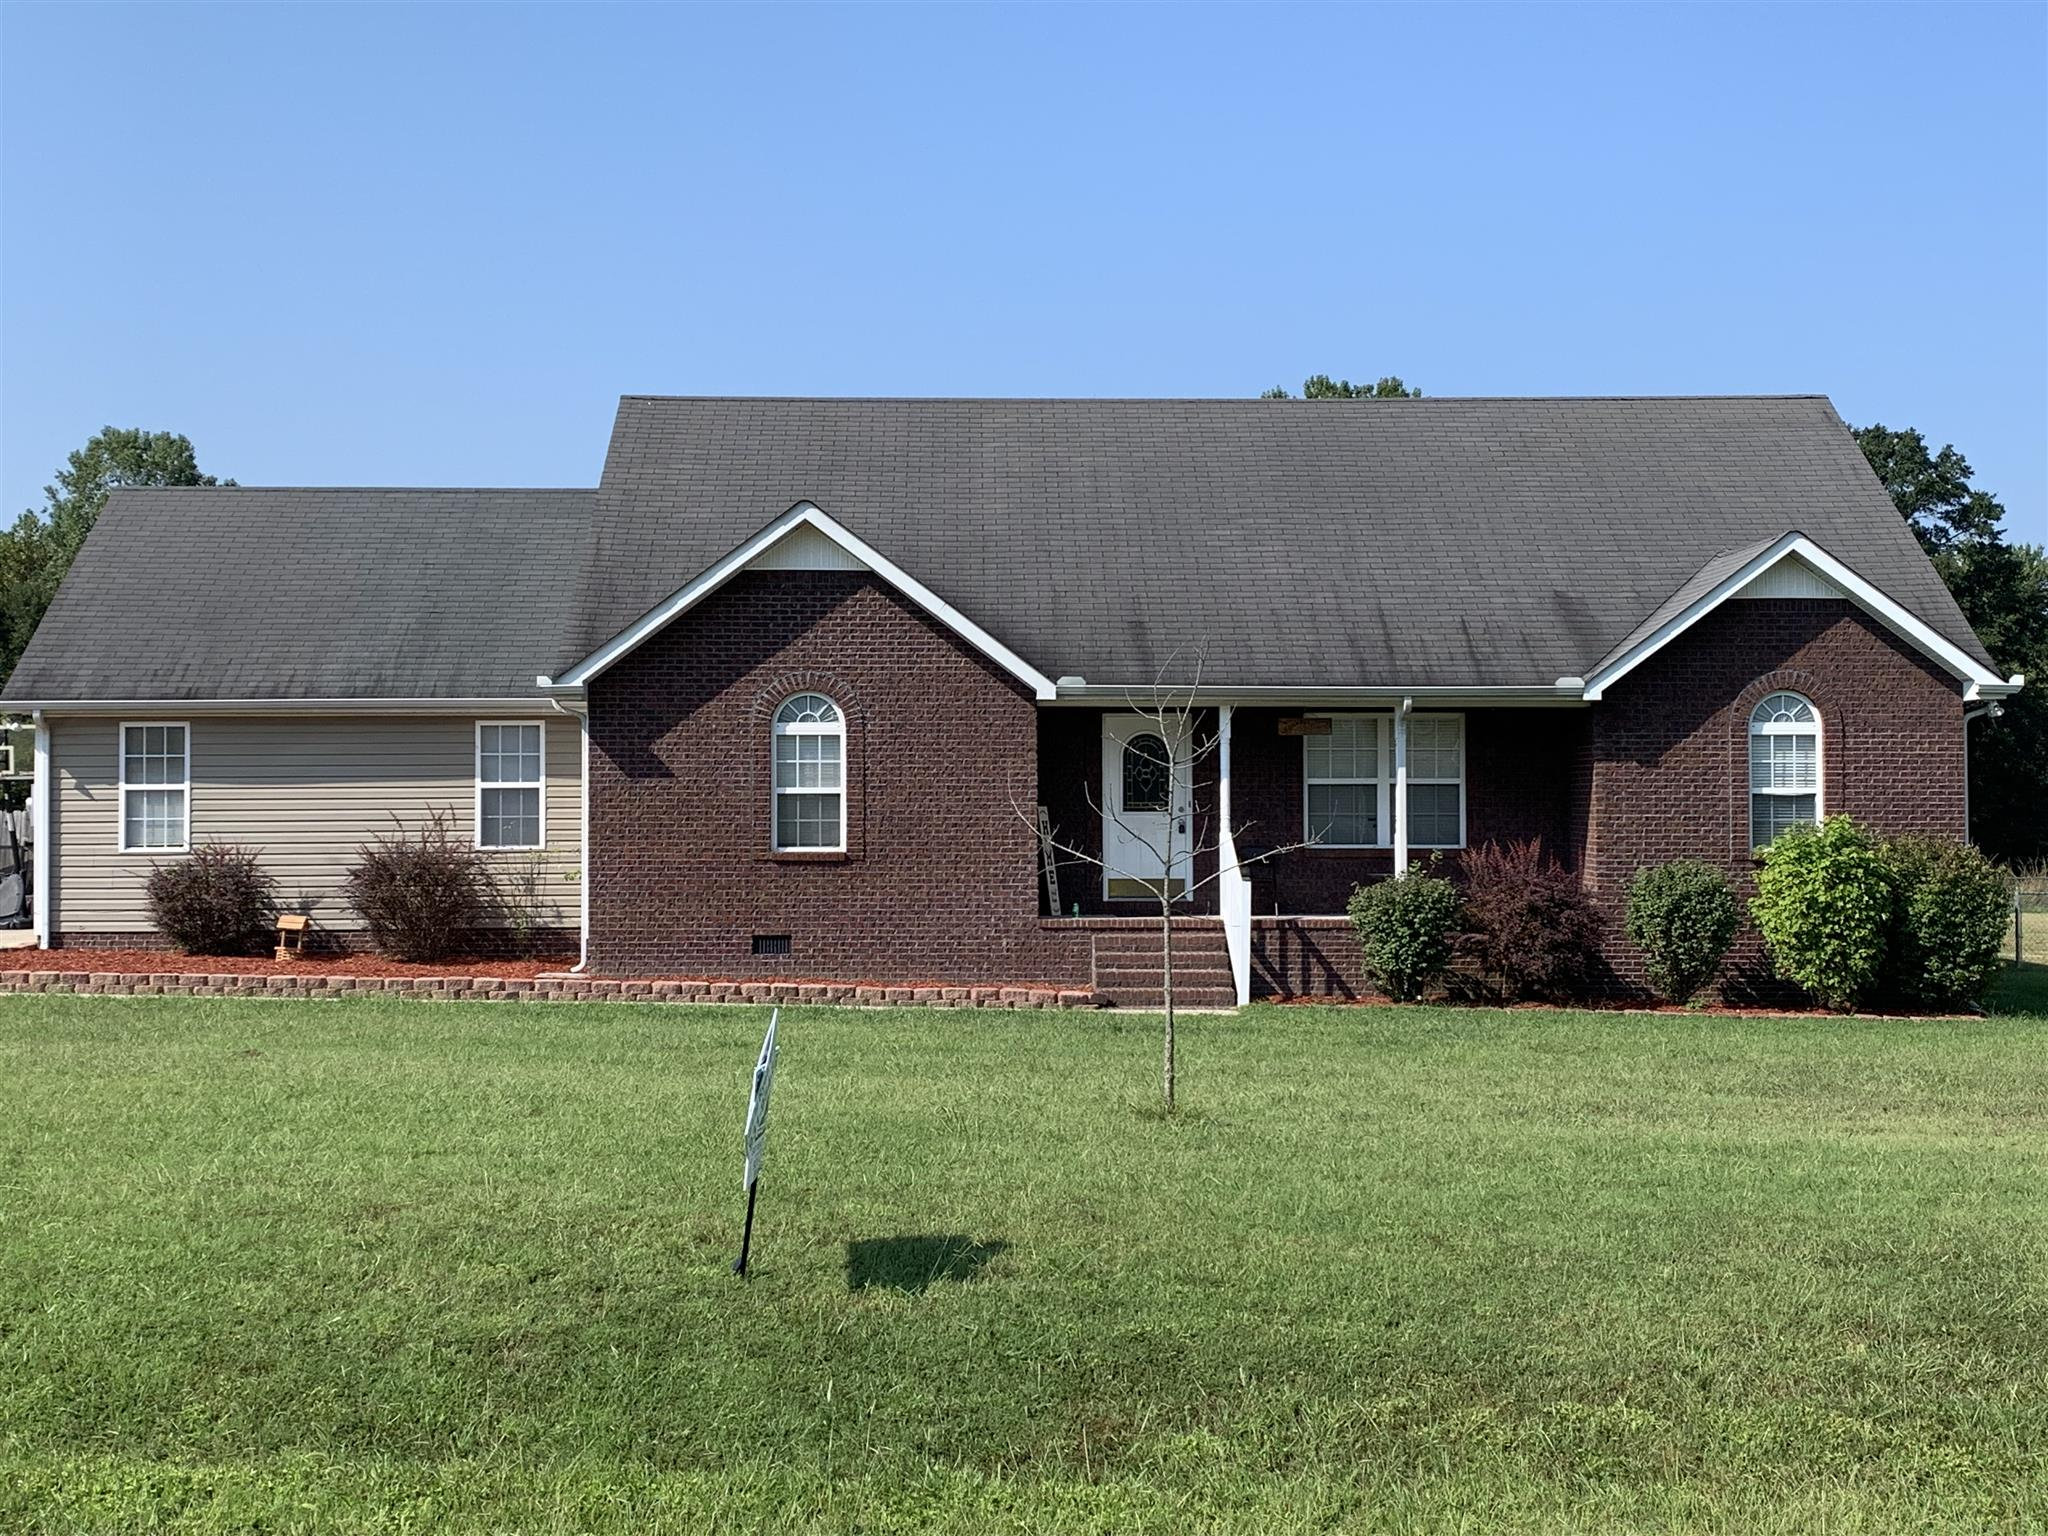 156 Coventry Ct, Hillsboro, TN 37342 - Hillsboro, TN real estate listing